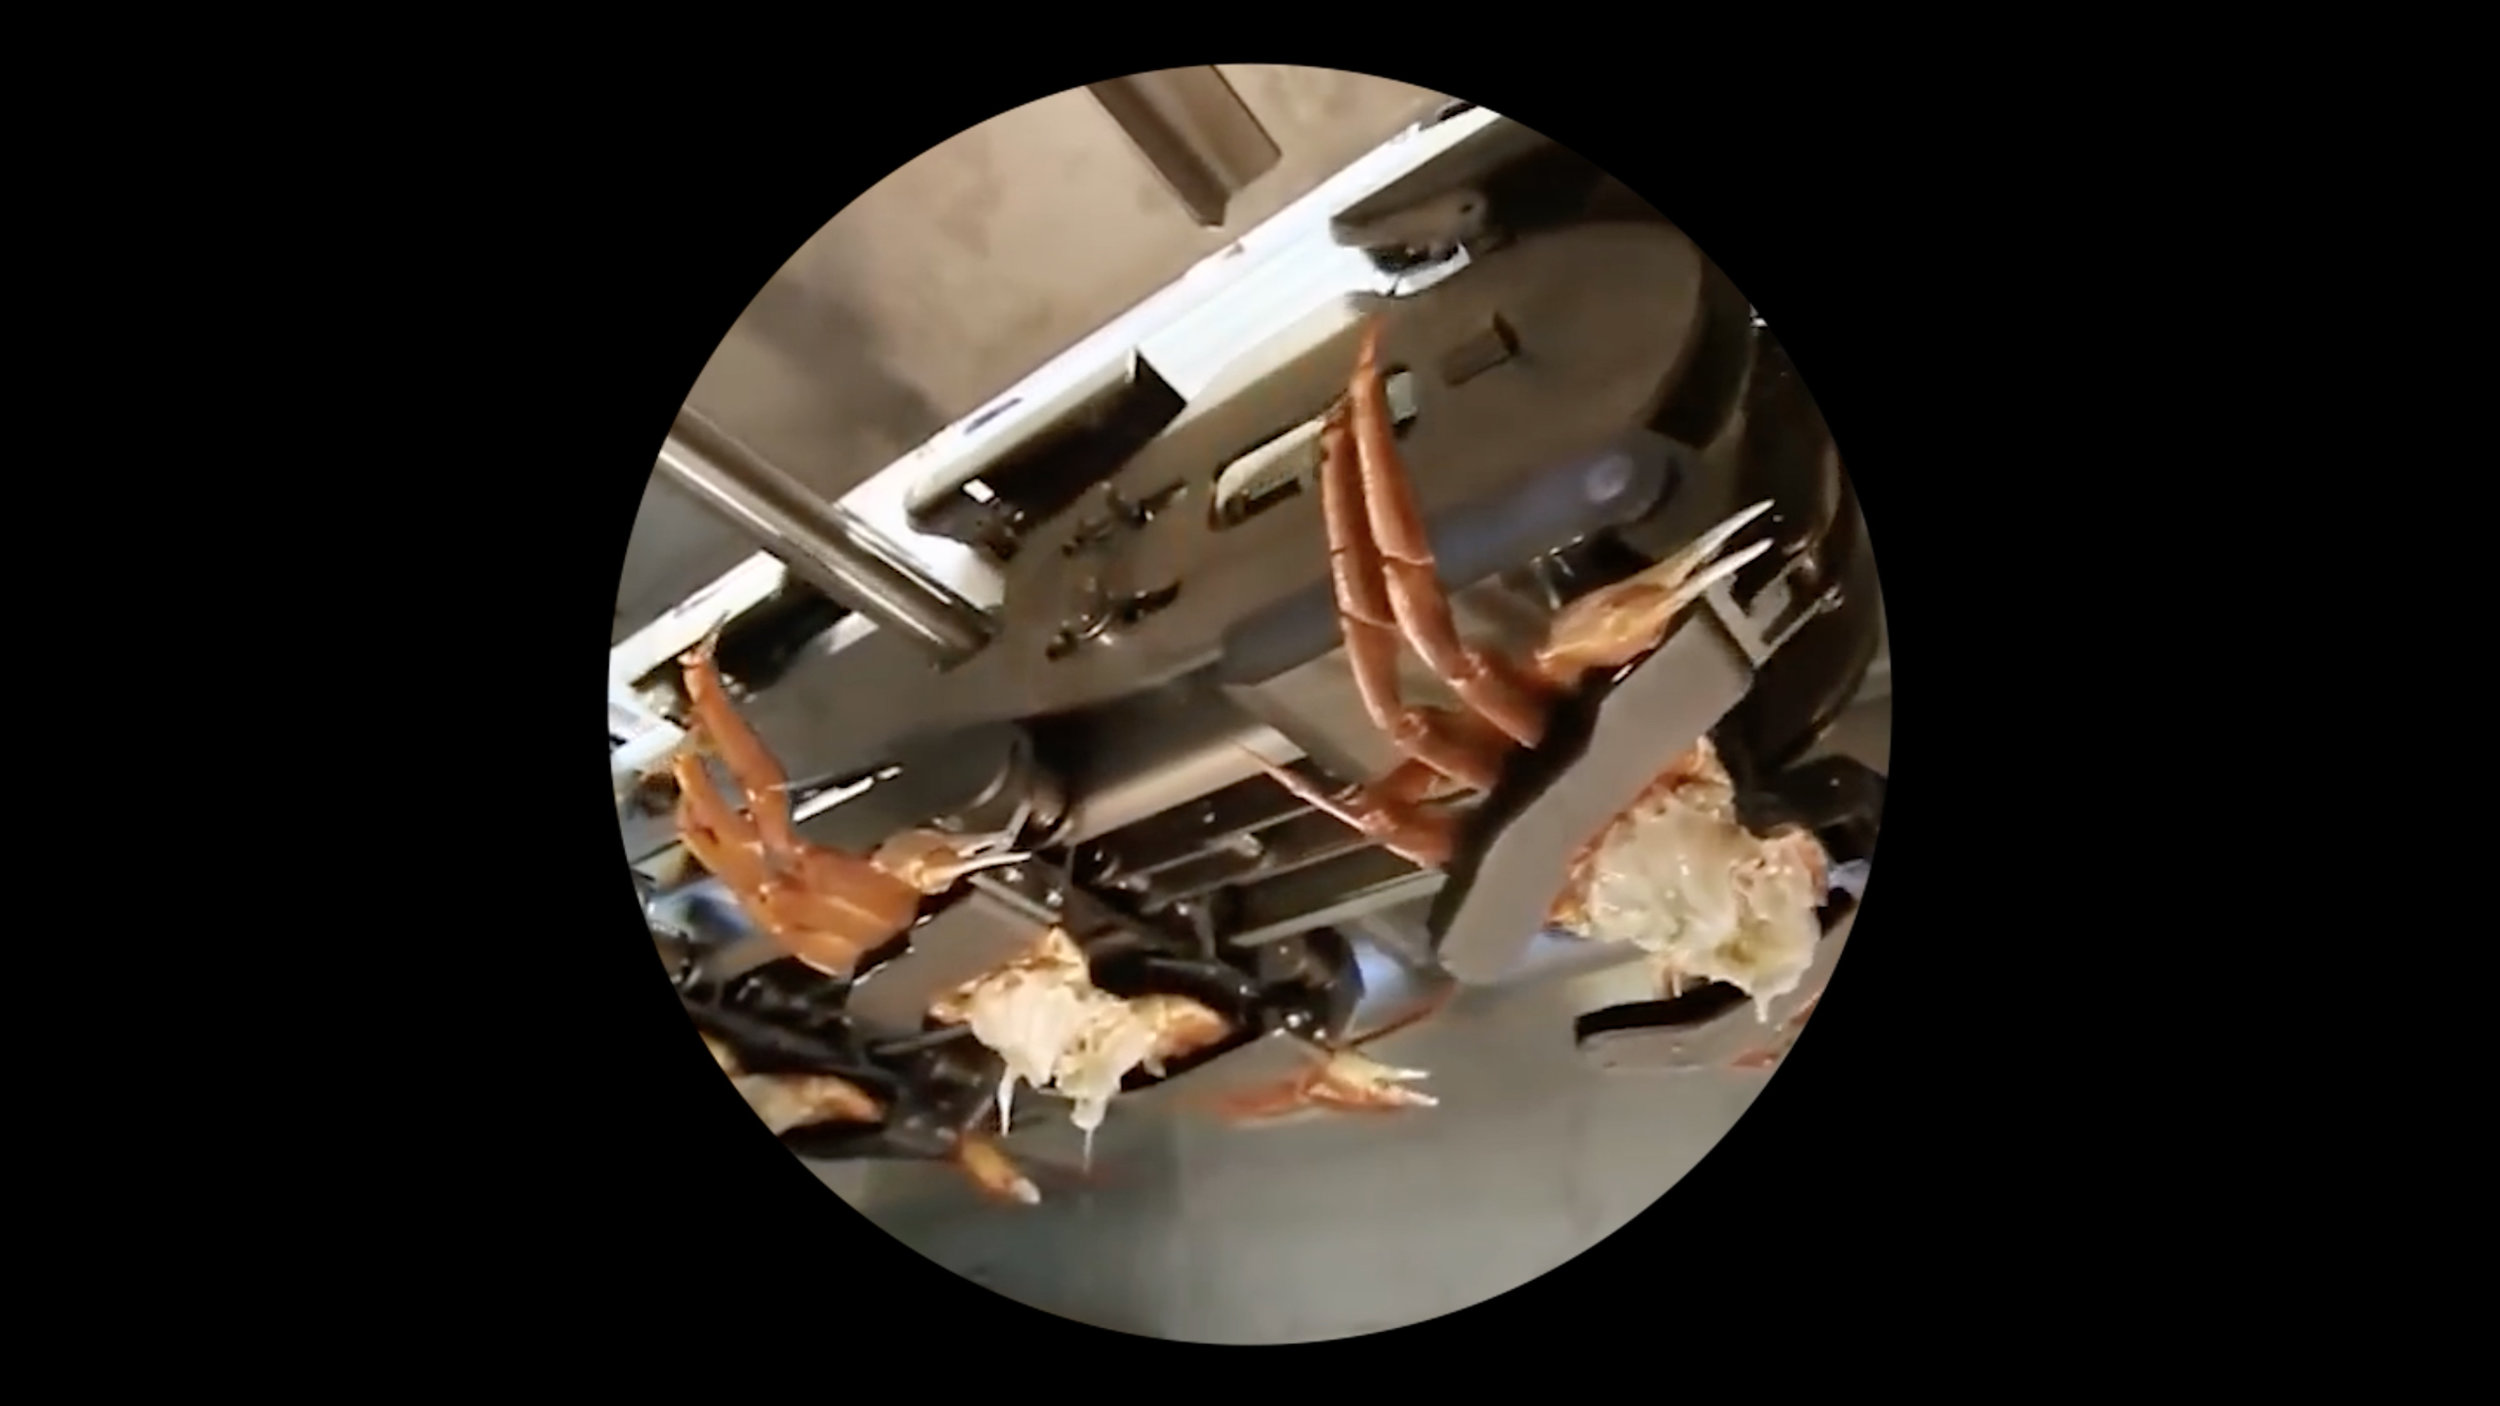 Jing Lin,  Machinetopia , 2018. Loop video, Edition of 5 + 1 AP. ©Jing Lin, courtesy Fou Gallery | 林璟, 机器托帮, 2018. 循环视频,版数:5 + 1 AP. ©林璟,致谢否画廊